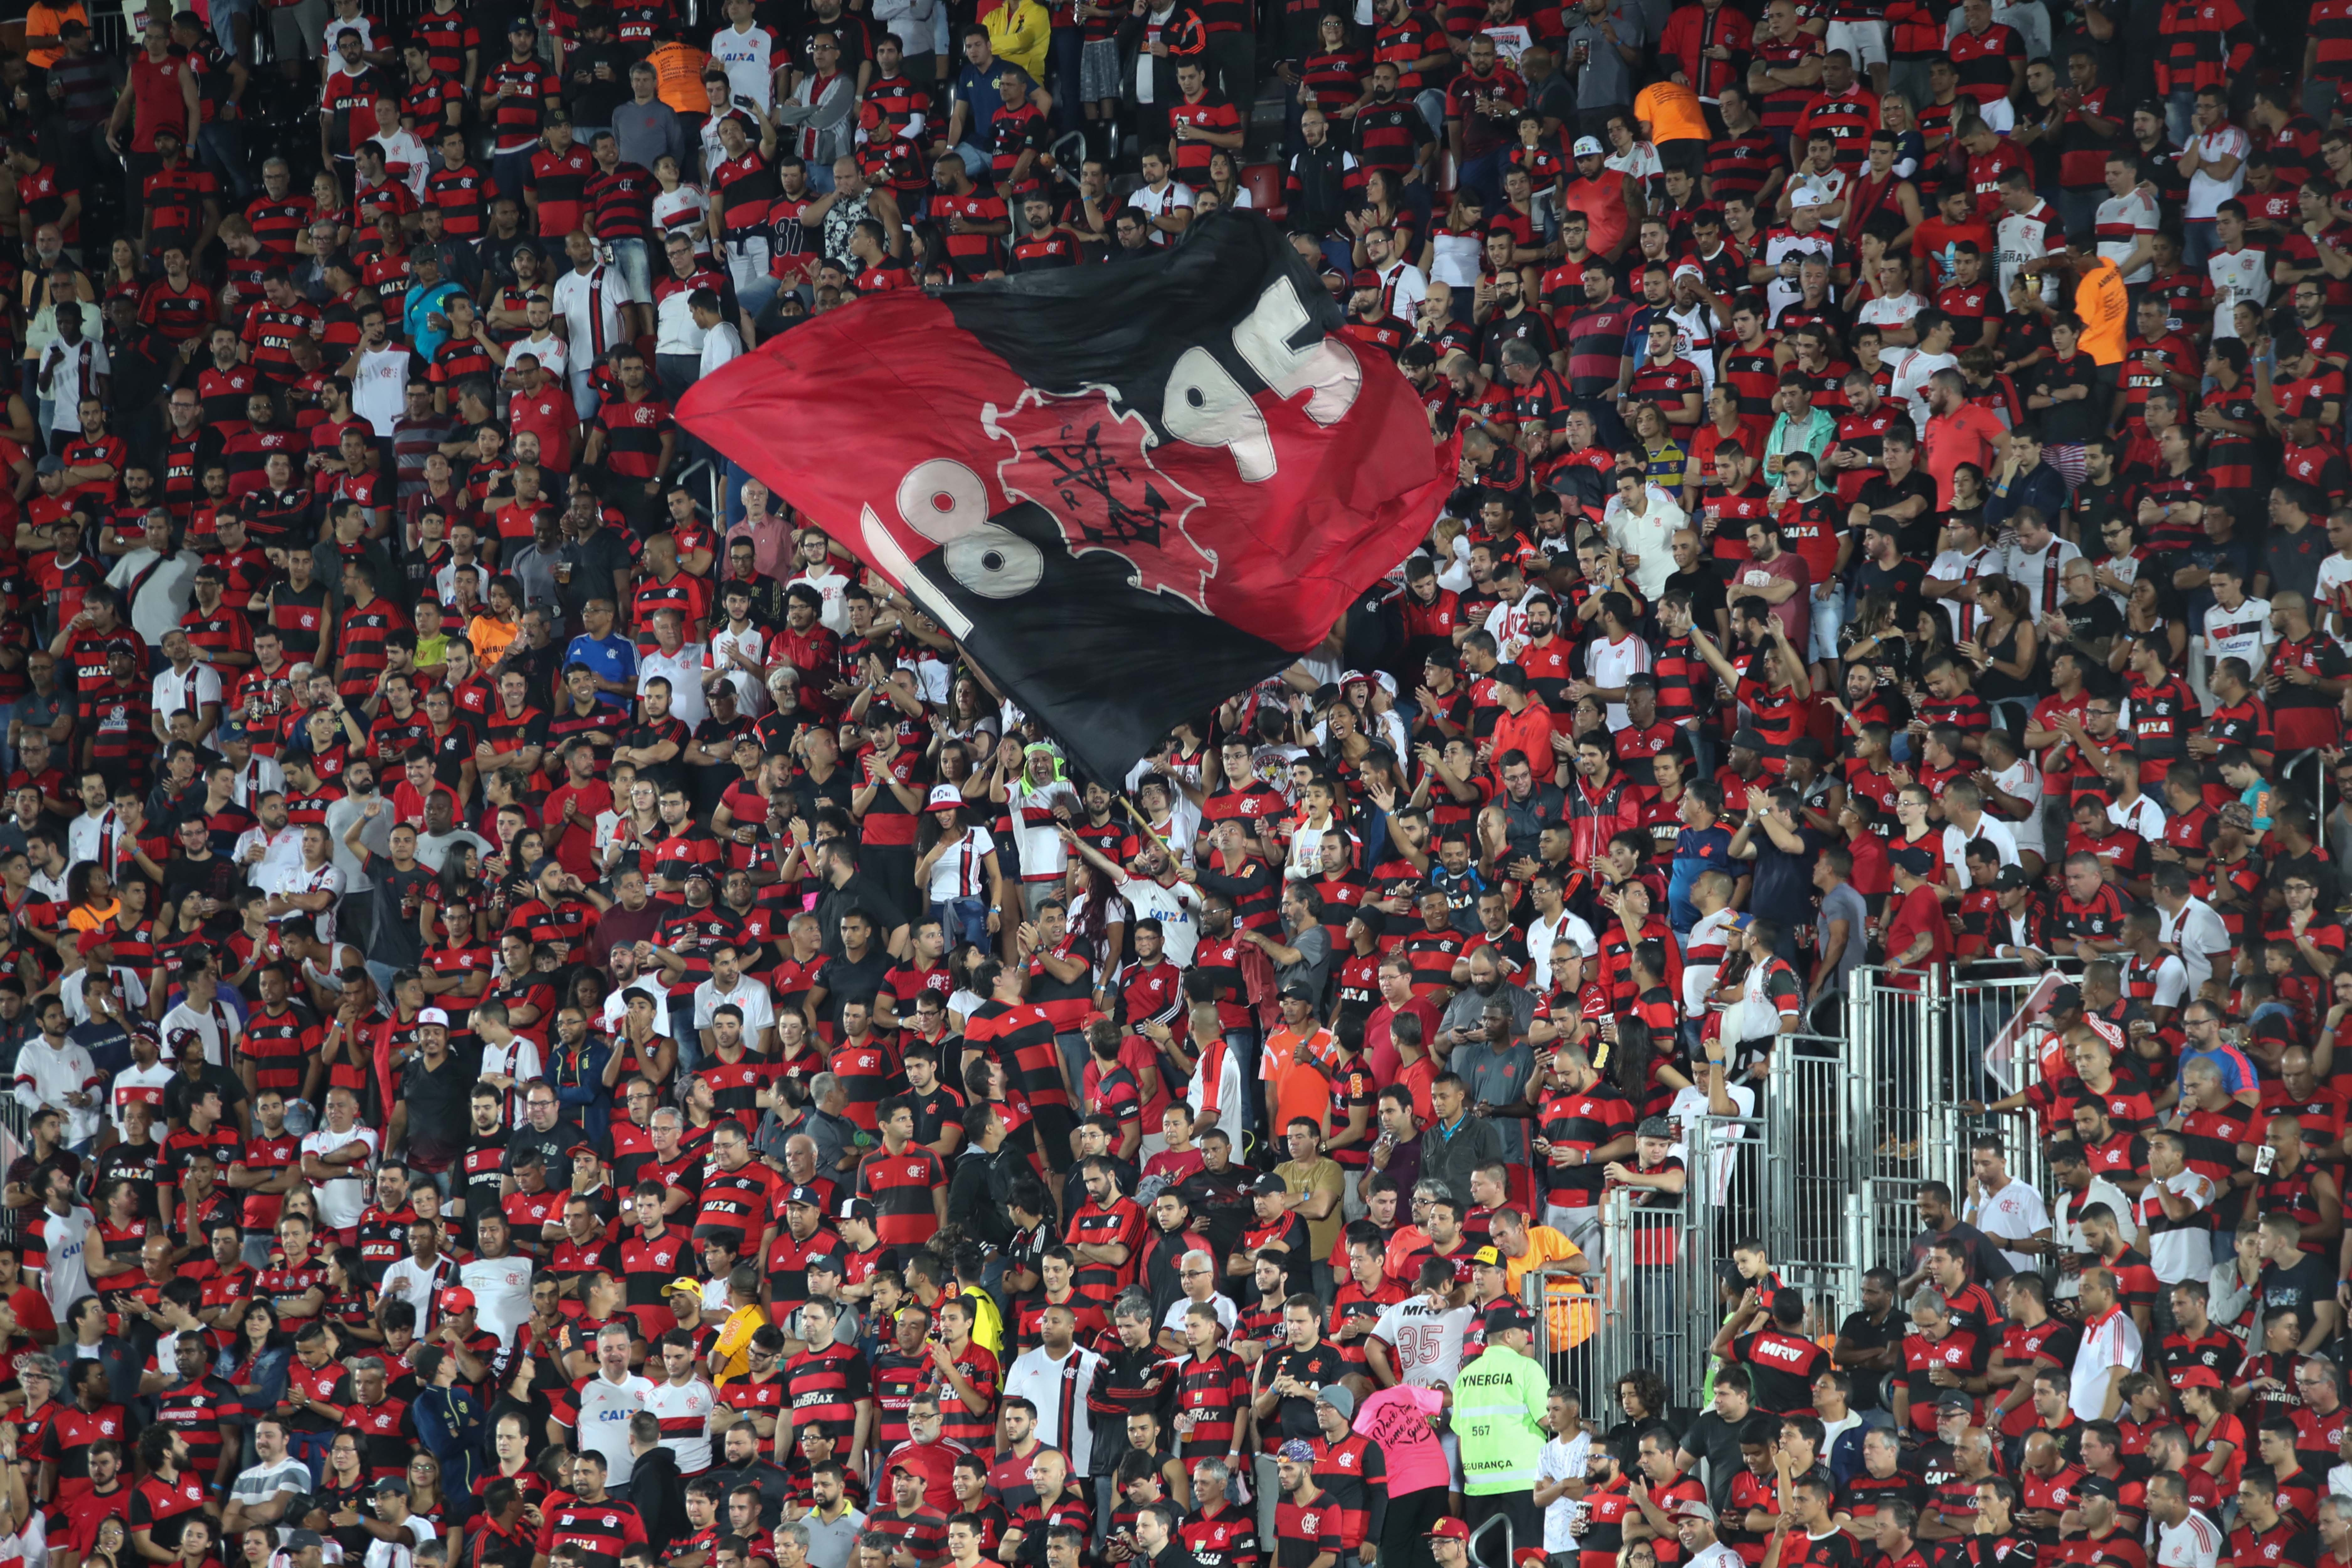 Torcida Flamengo Ilha do Urubu